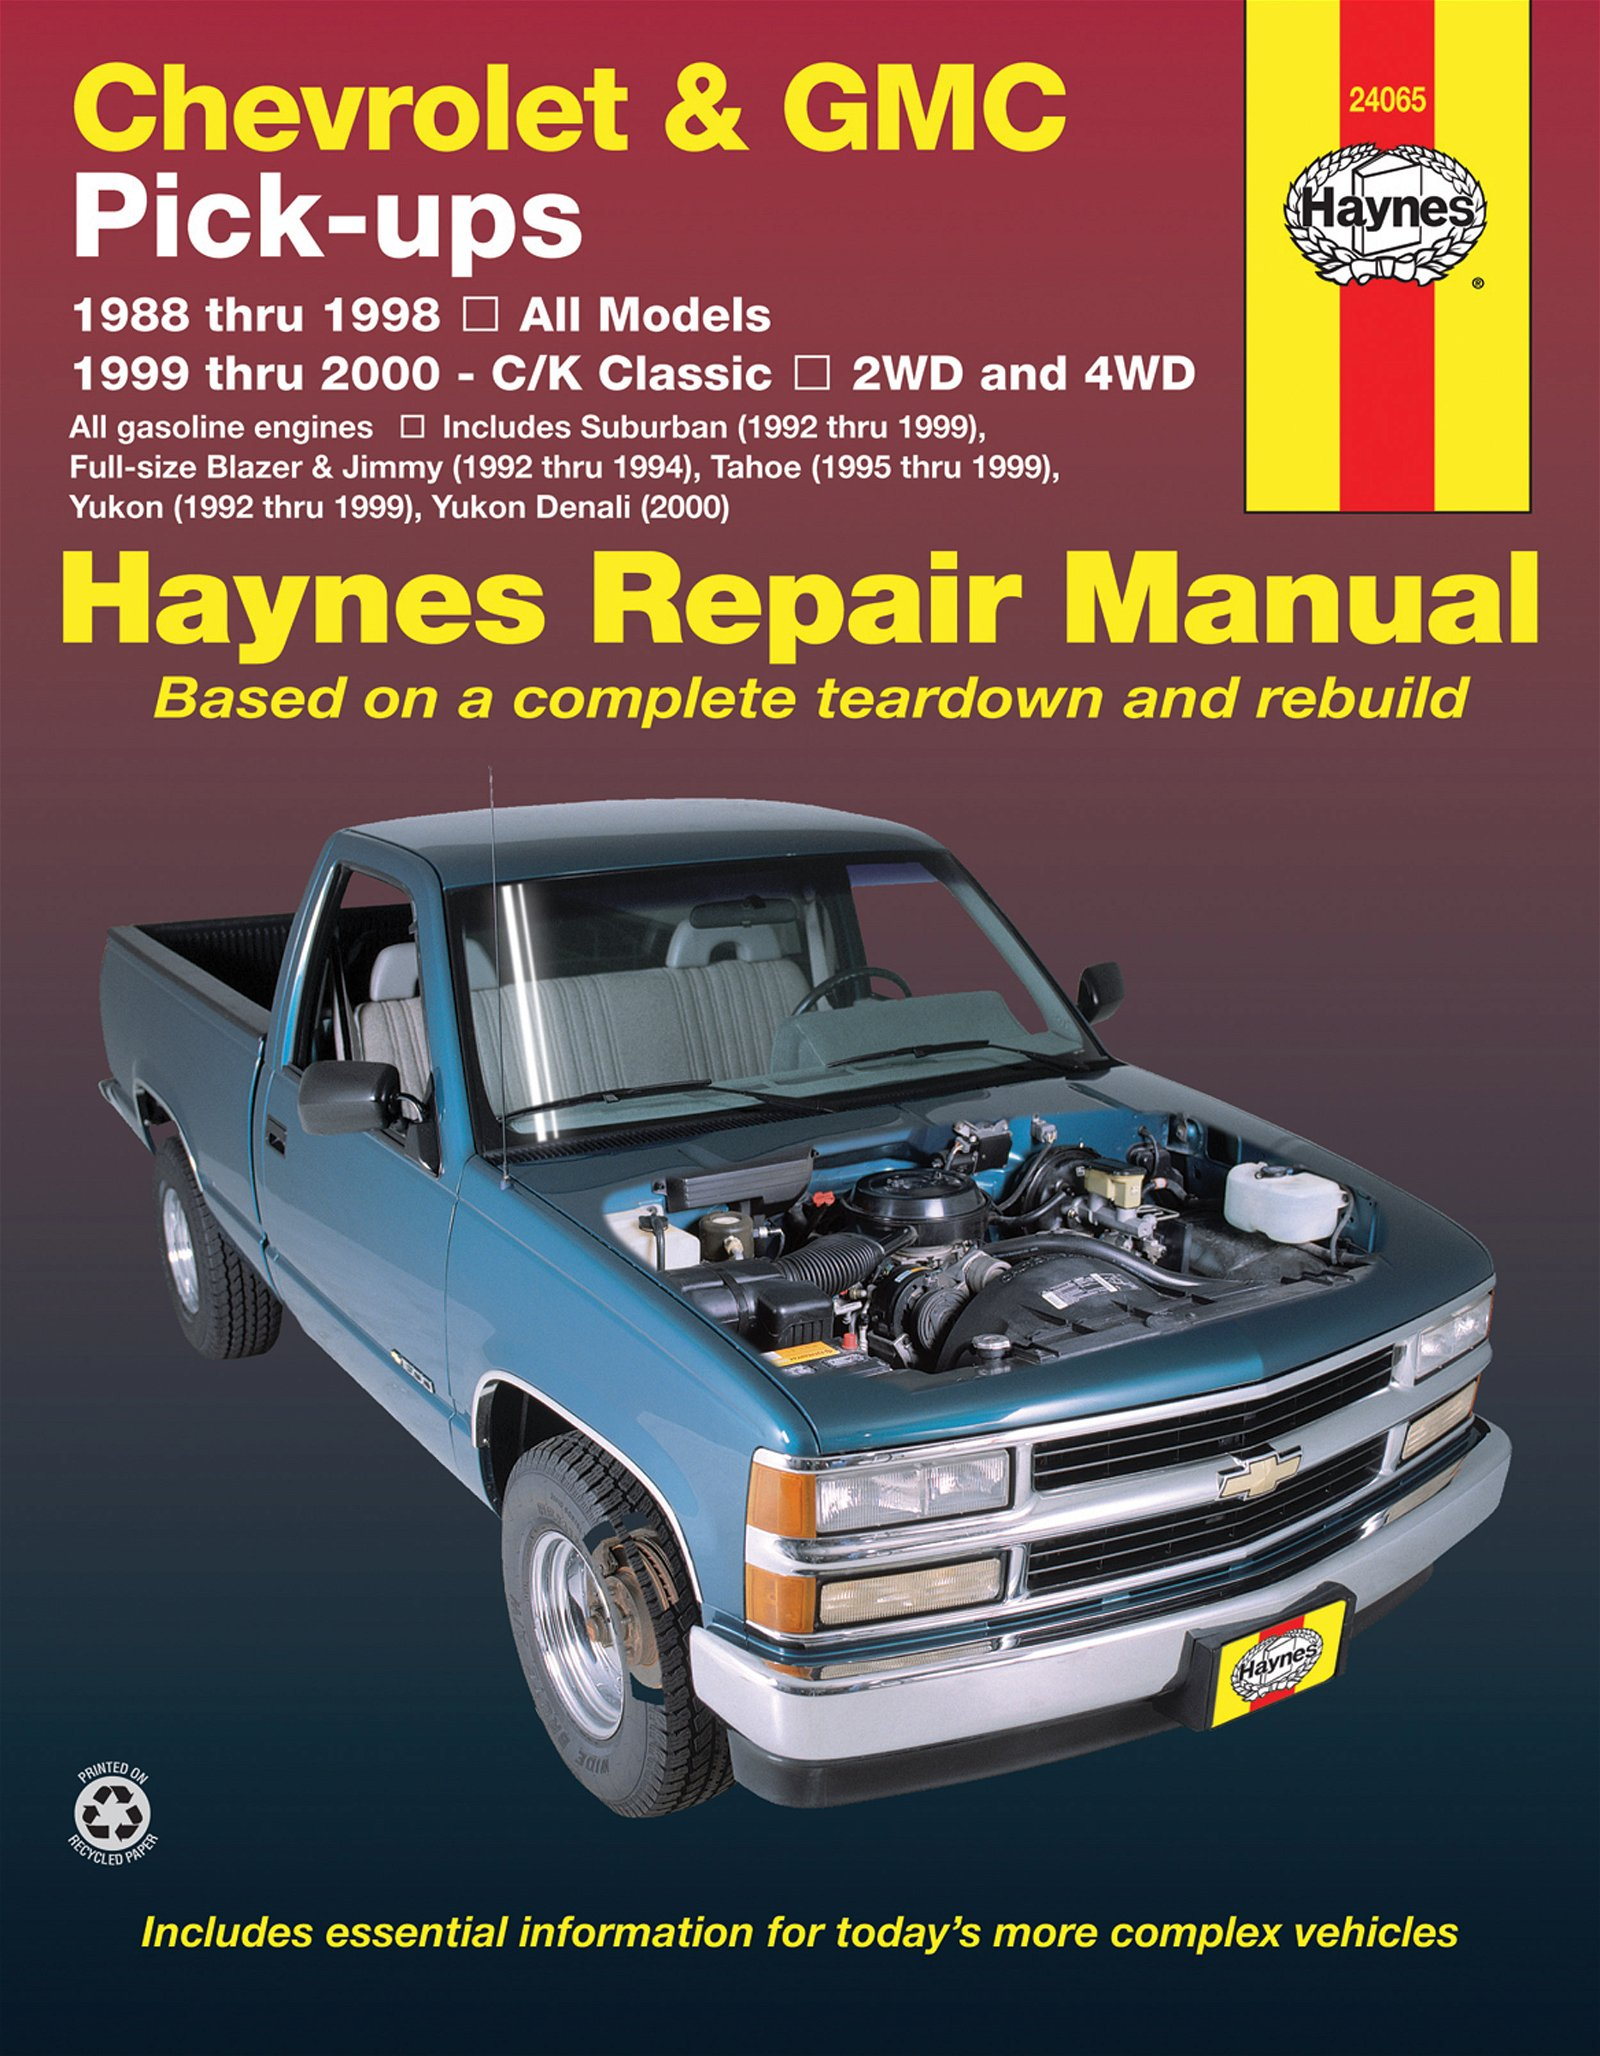 [Manuel US en Anglais] Chevrolet & GMC Pick-ups, 2WD  & 4WD  '88 -  '00